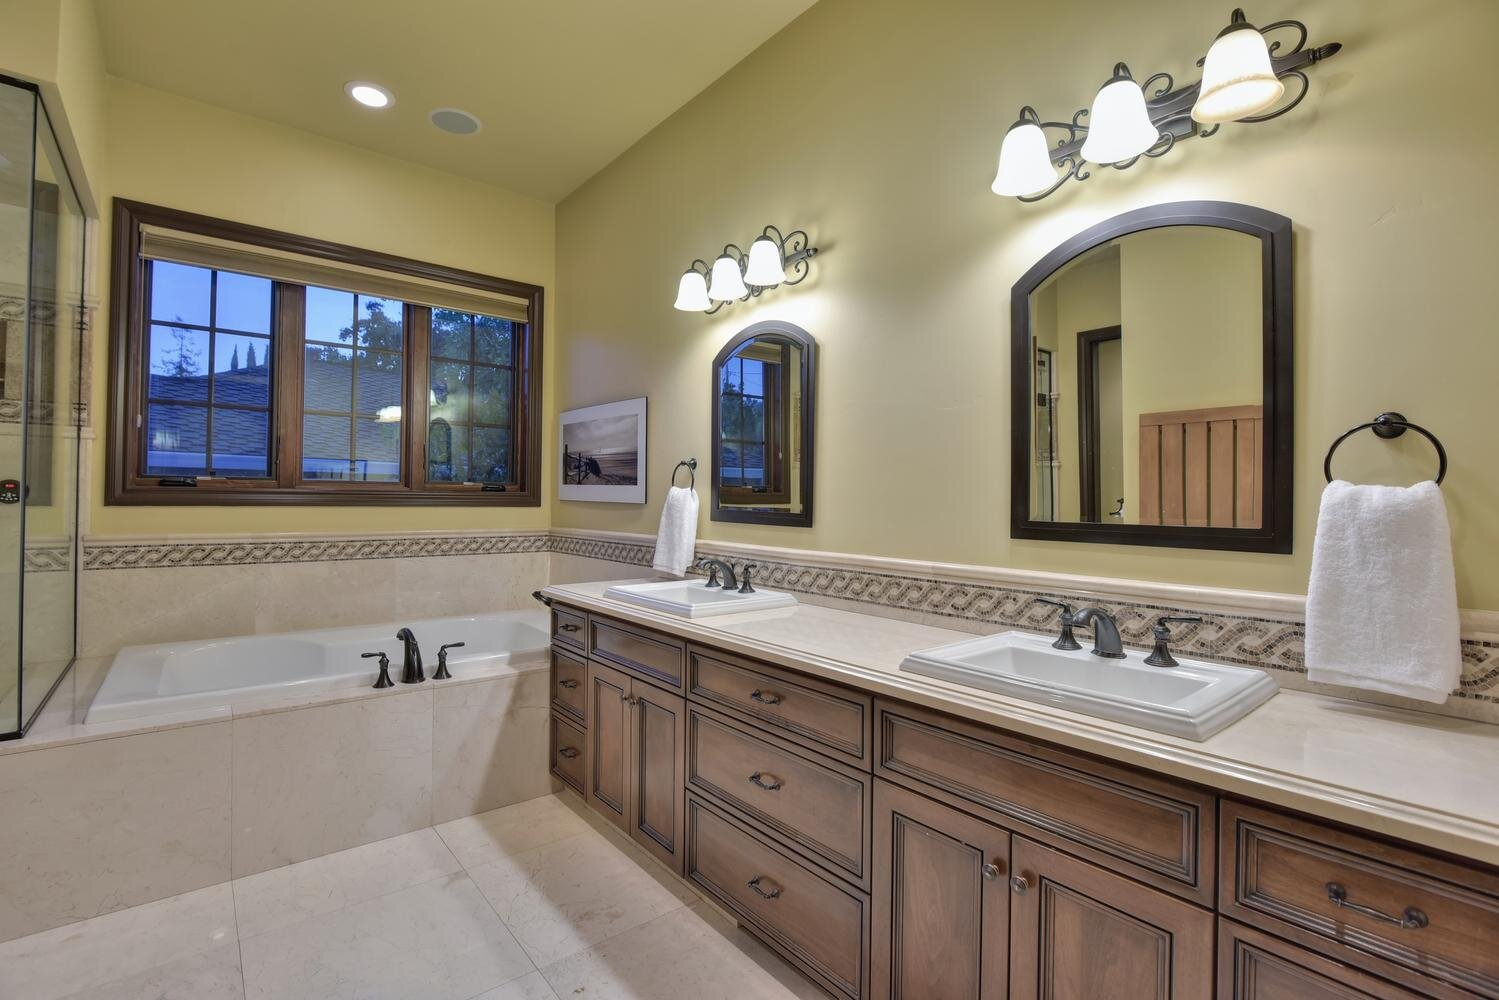 16021 Winterbrook Rd Los Gatos-large-037-002-Master Bathroom-1499x1000-72dpi.jpg